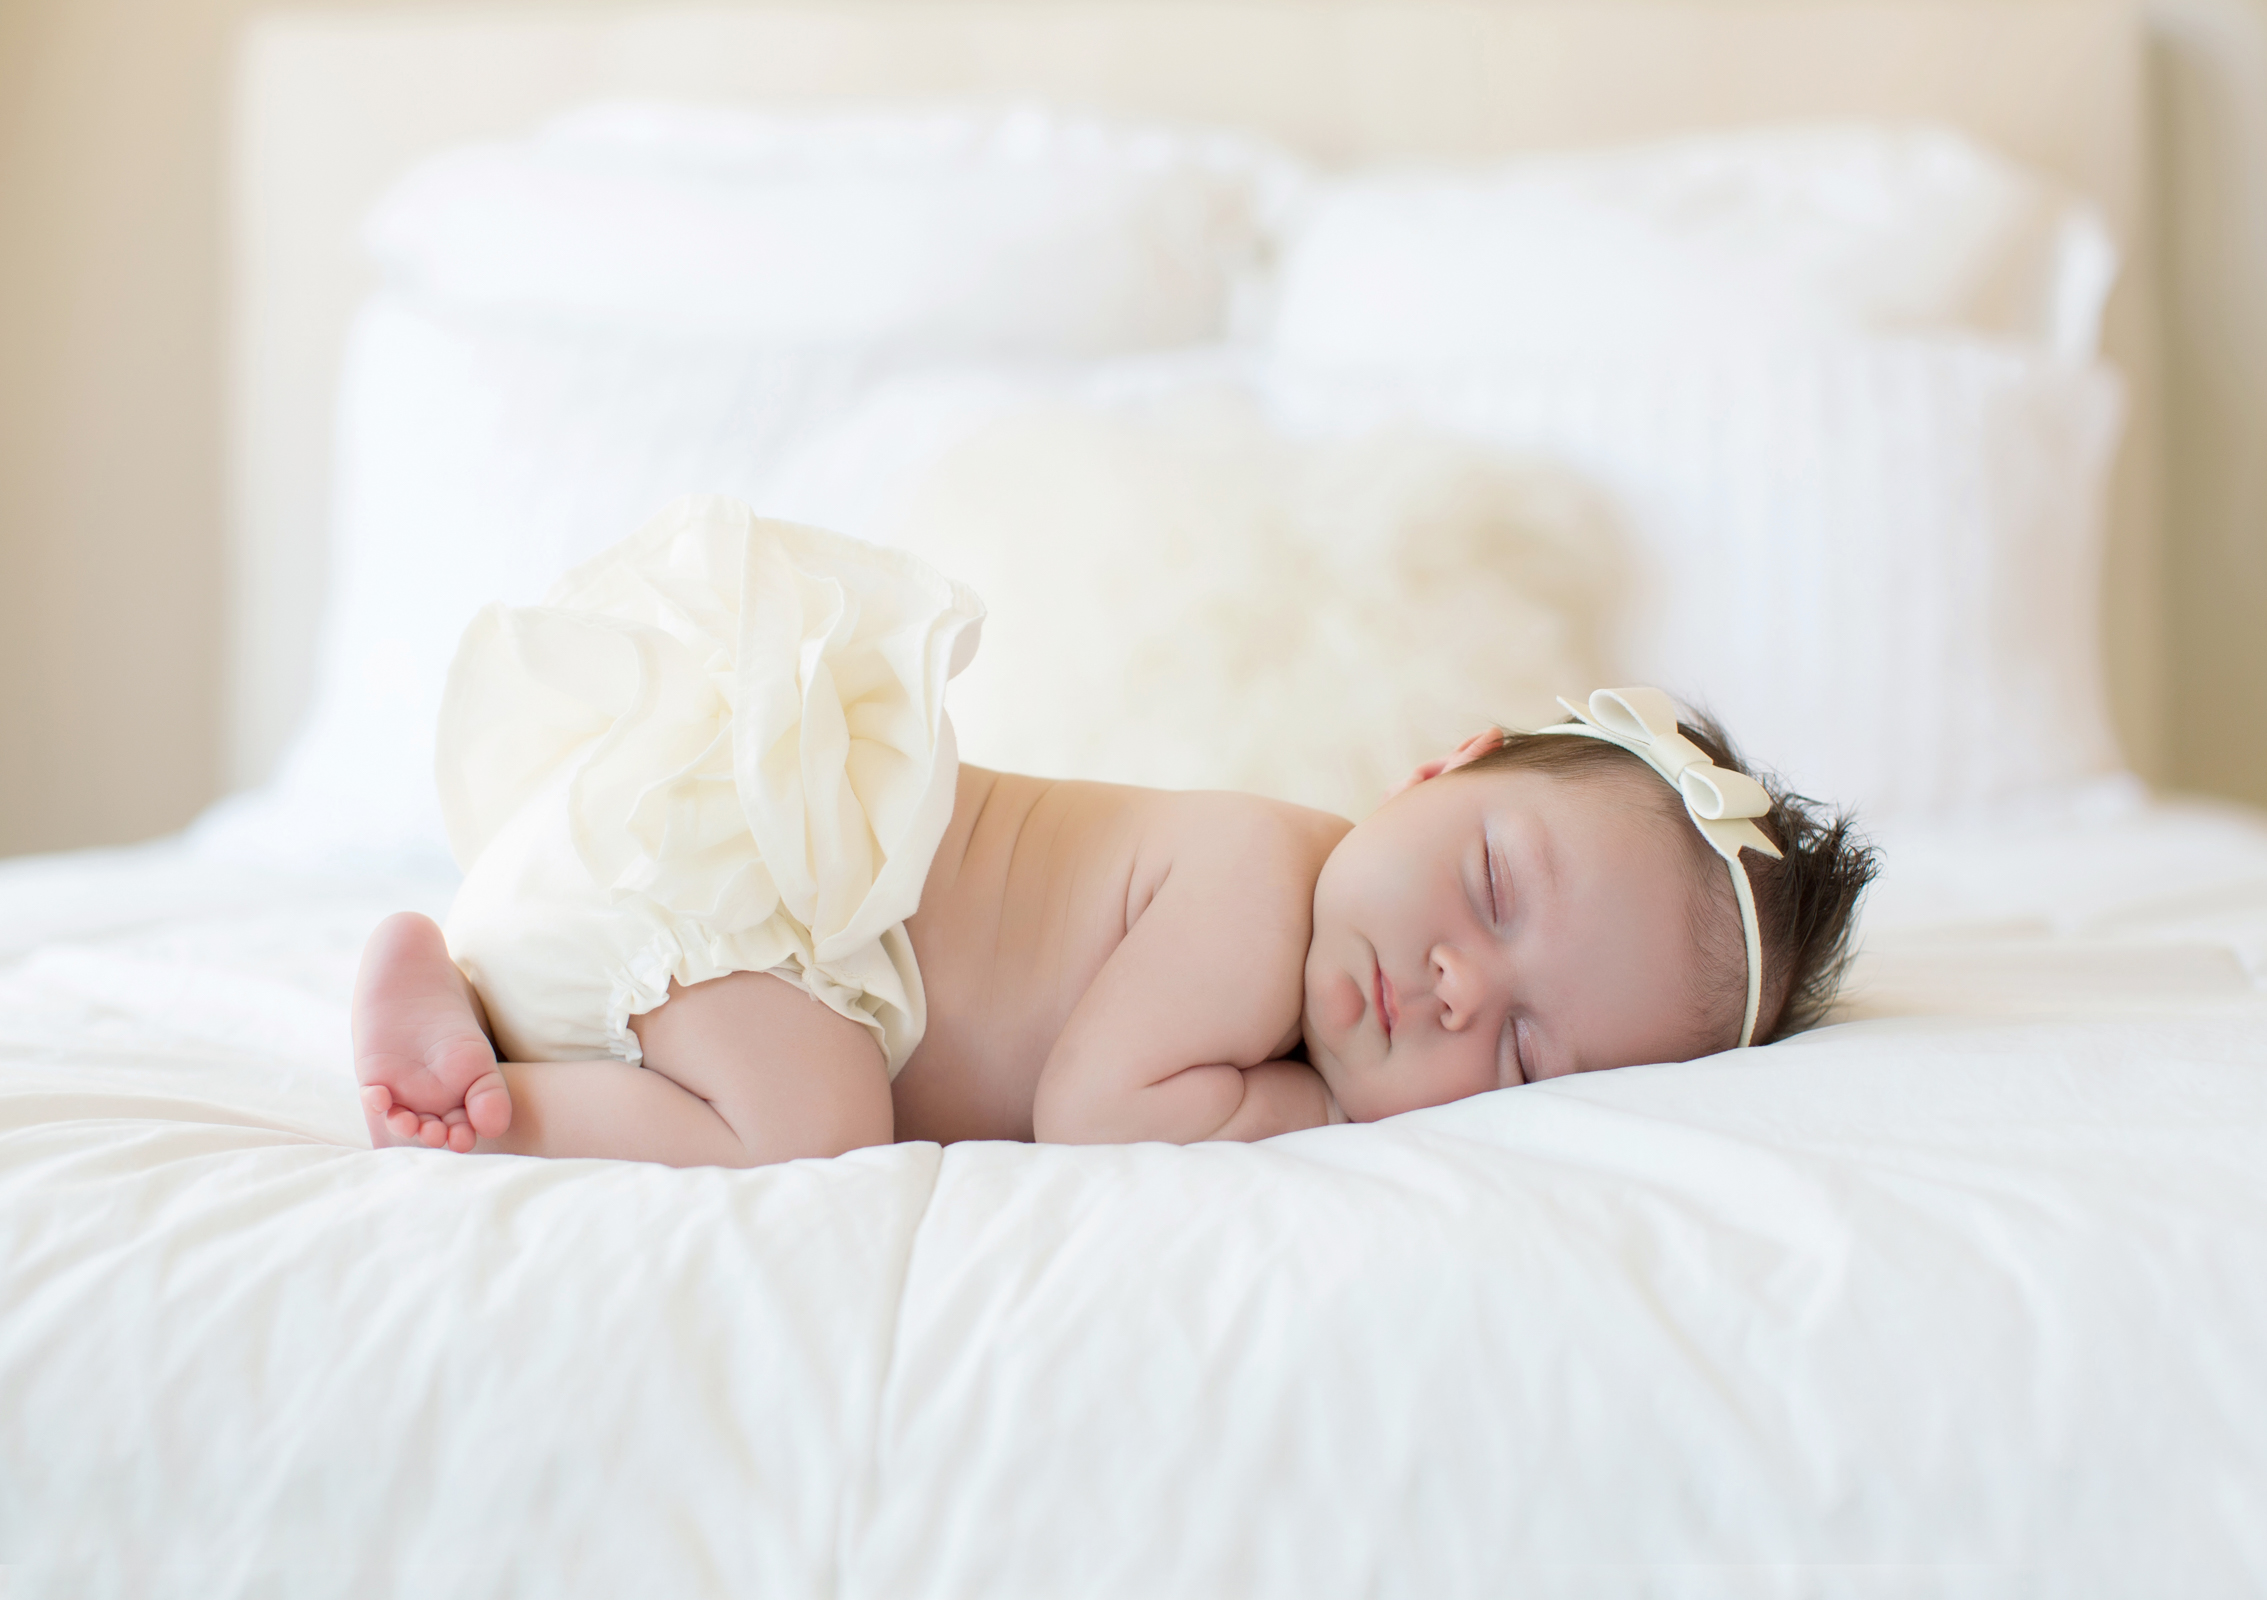 peacefully-sleeping-newborn-girl.jpg